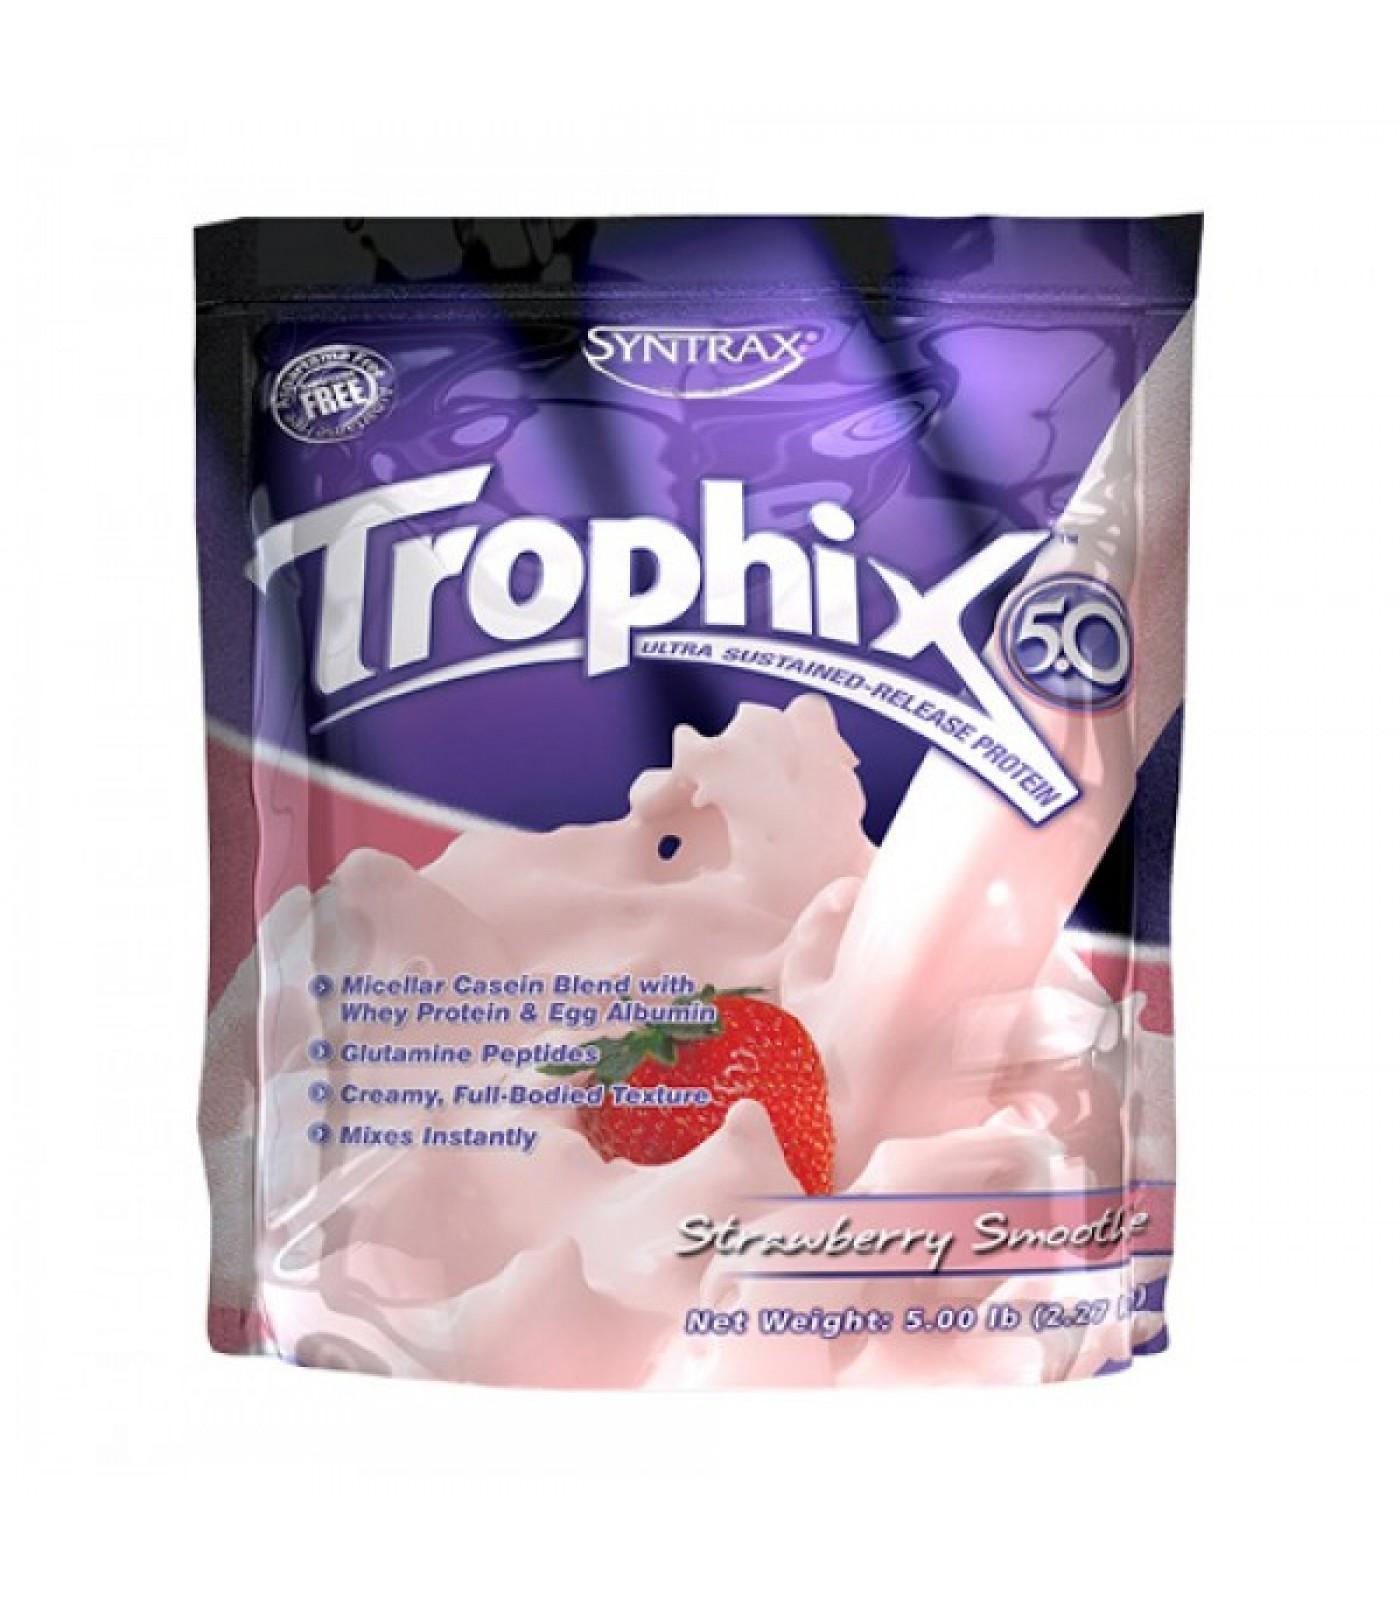 Syntrax - Trophix 5.0 / 2270 gr